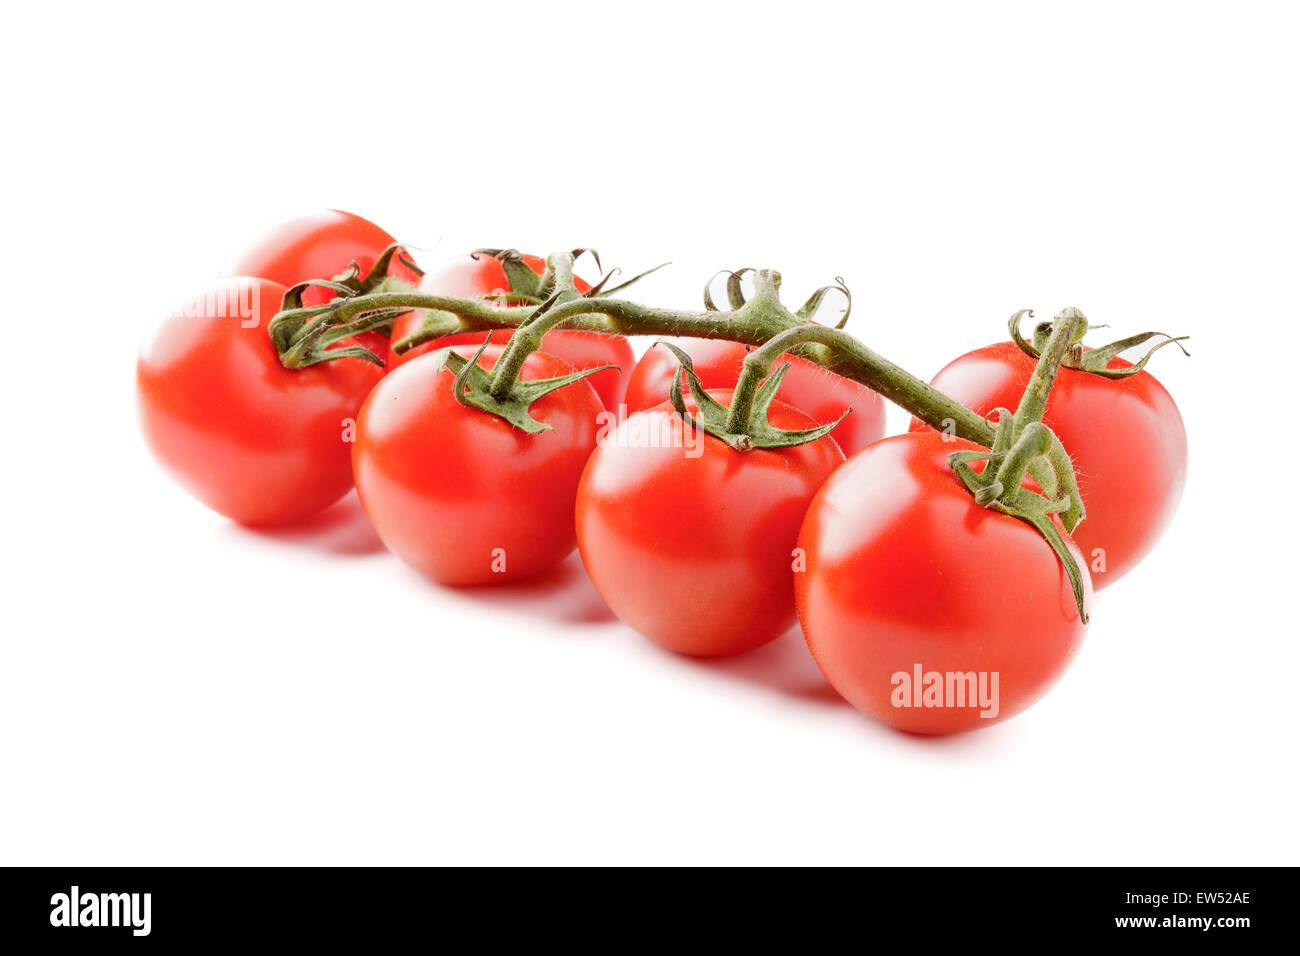 Vine Tomatoes - Stock Image